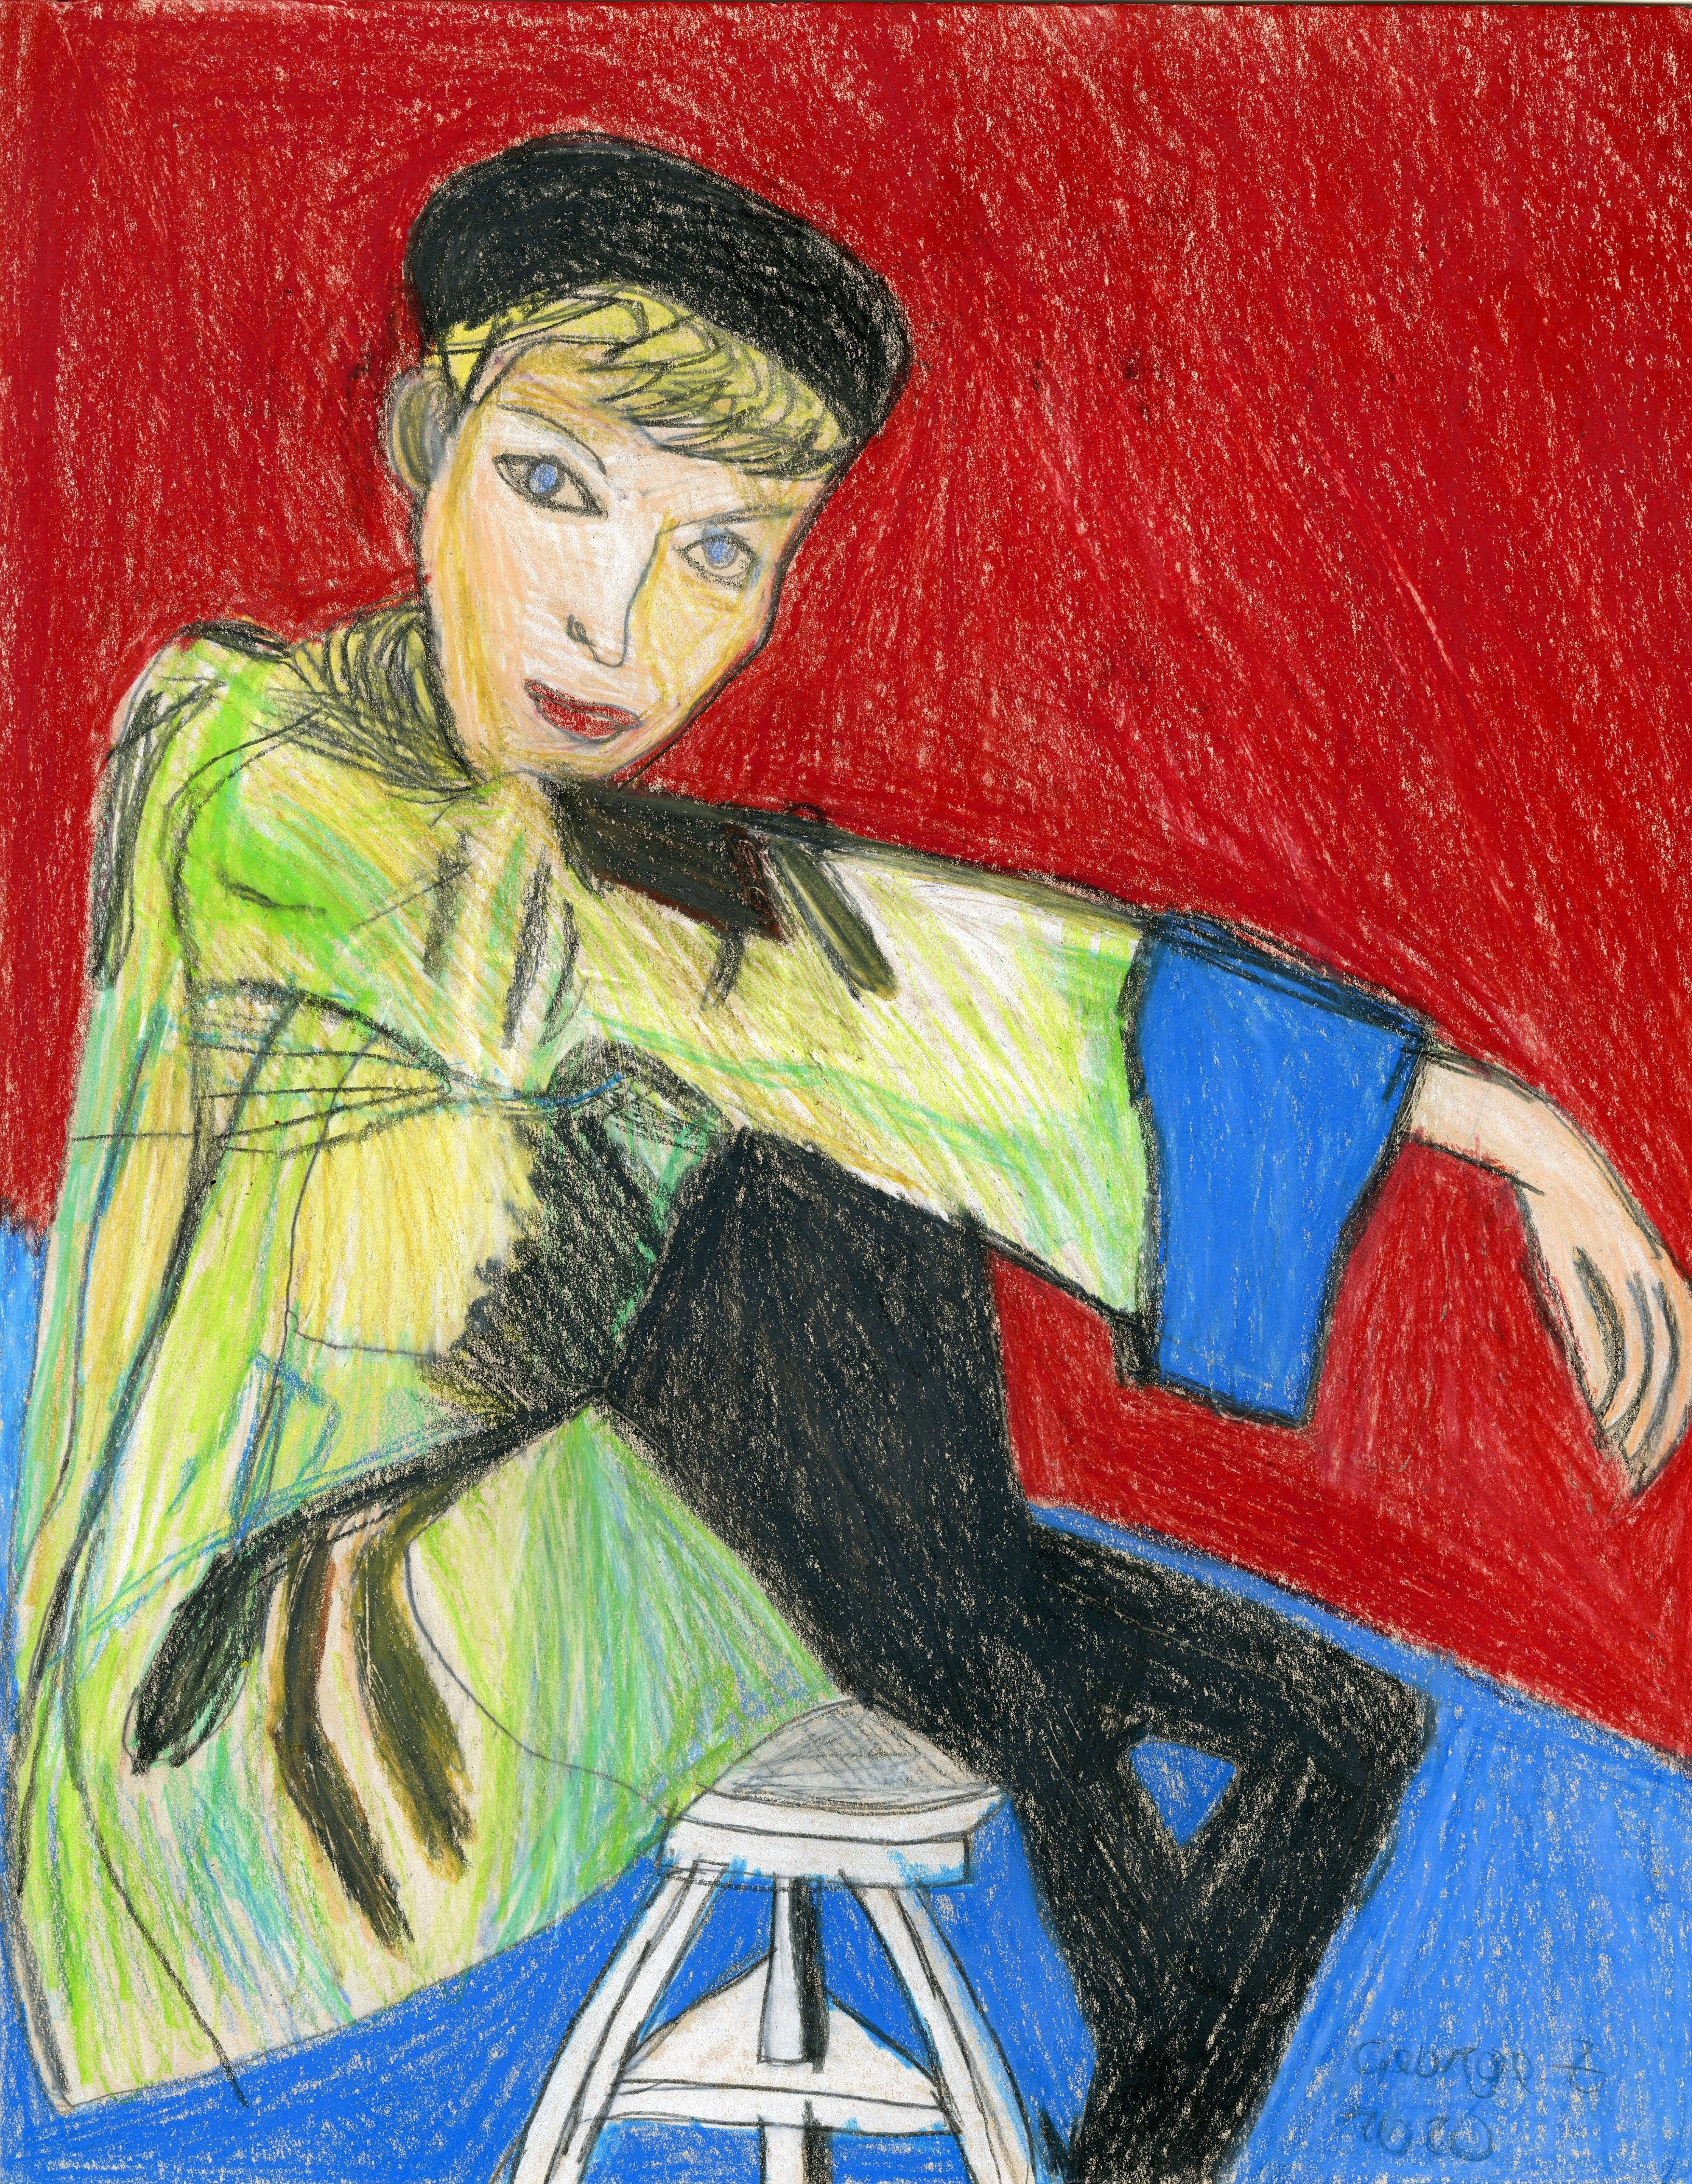 """Woman on Stool"" by George Zuniga"